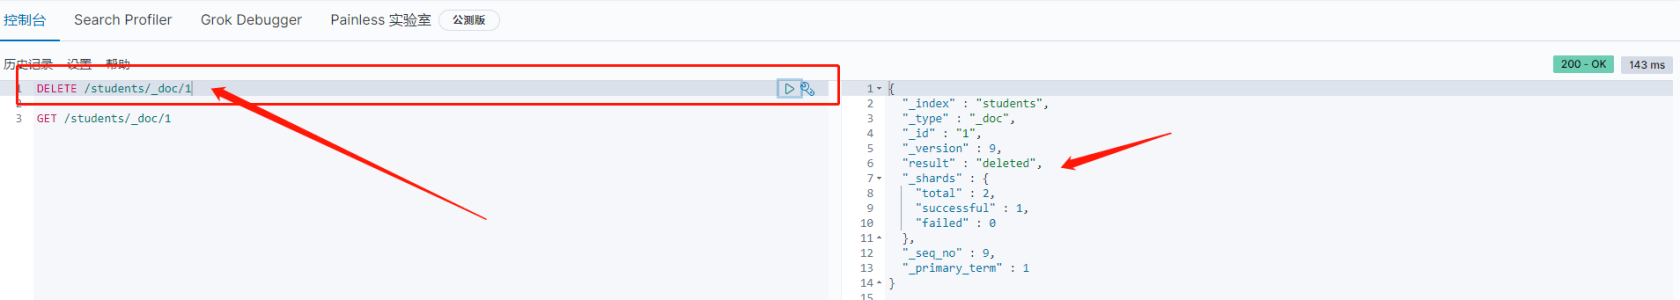 Docker ElasticSearch7.8.1 安装使用